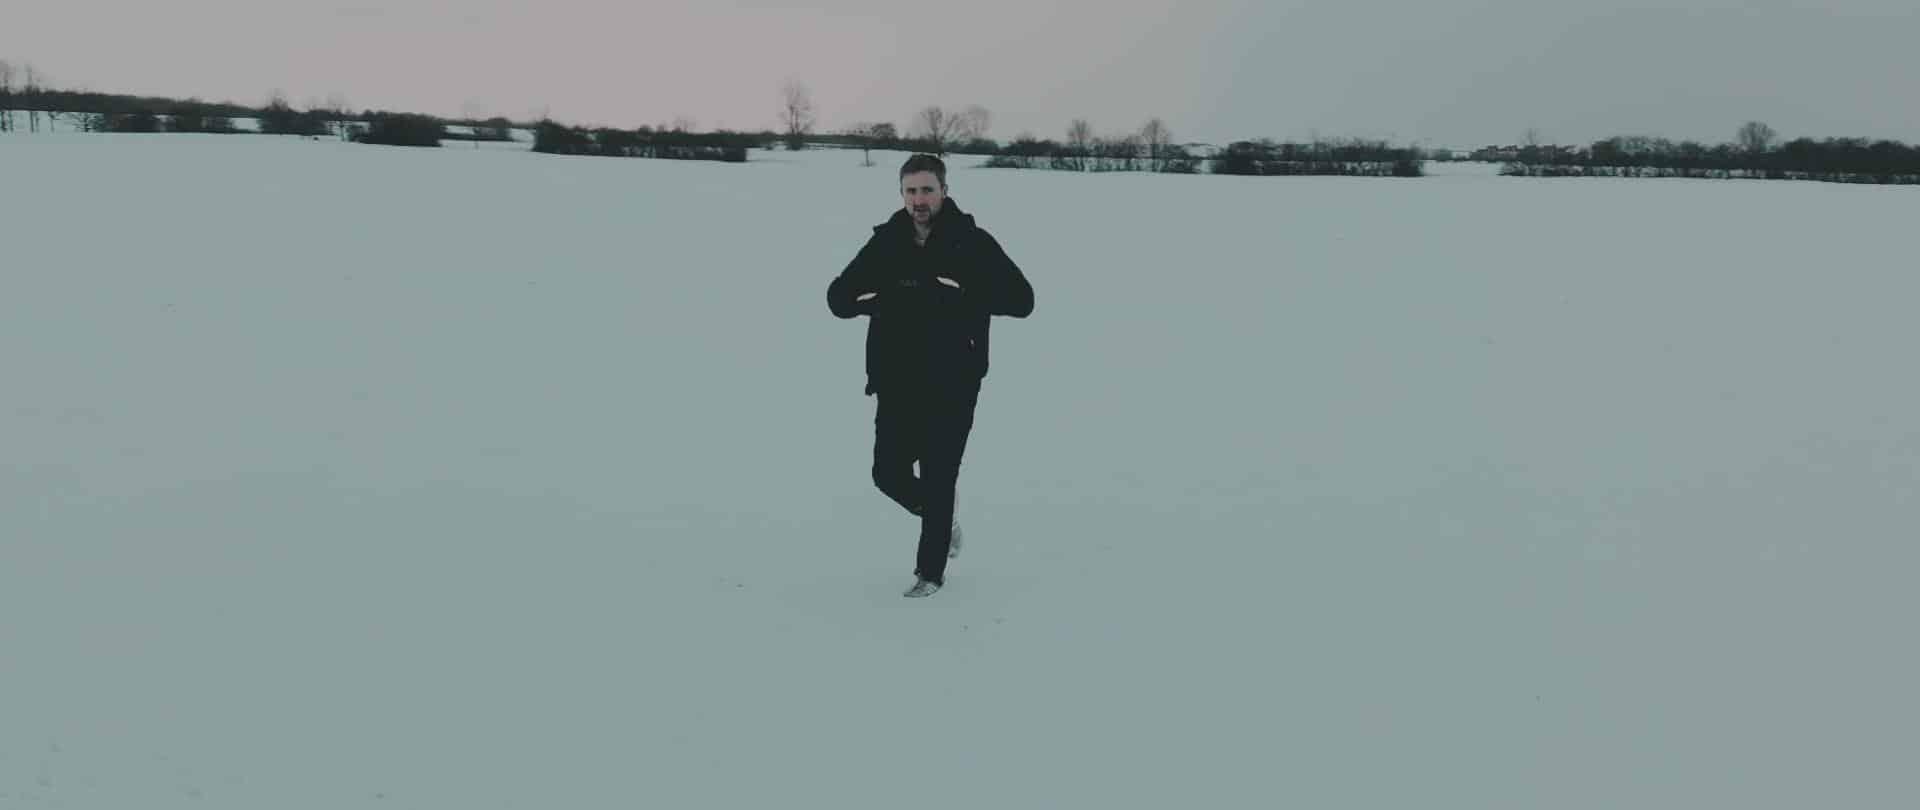 Blazin'Daniel - No Name (Musikvideo).00_03_54_58.Standbild263